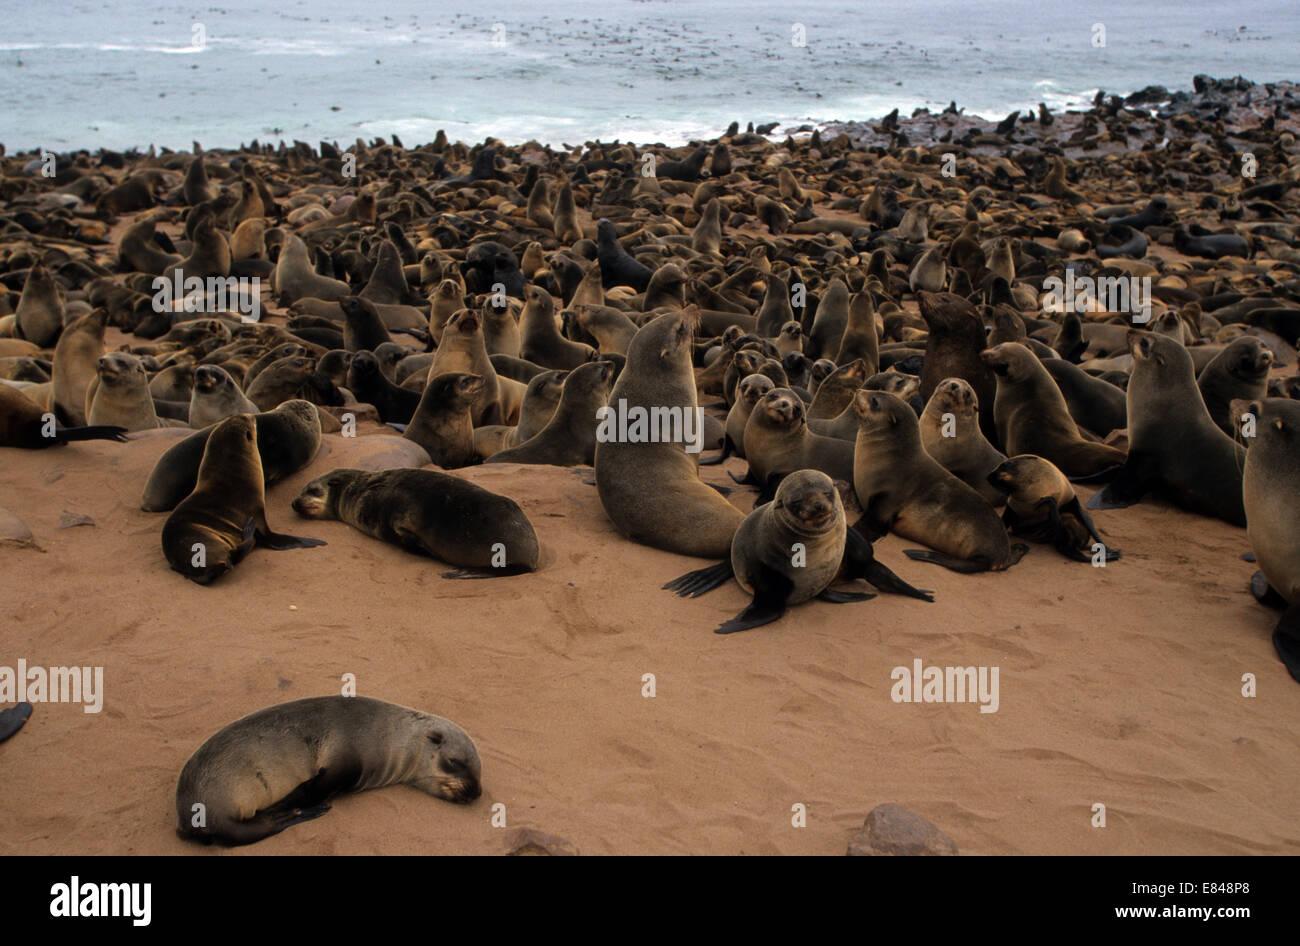 Cape Cross seal colony. The Cape fur seal (Arctocephalus pusillus pusillus) is the largest species of fur seal in - Stock Image